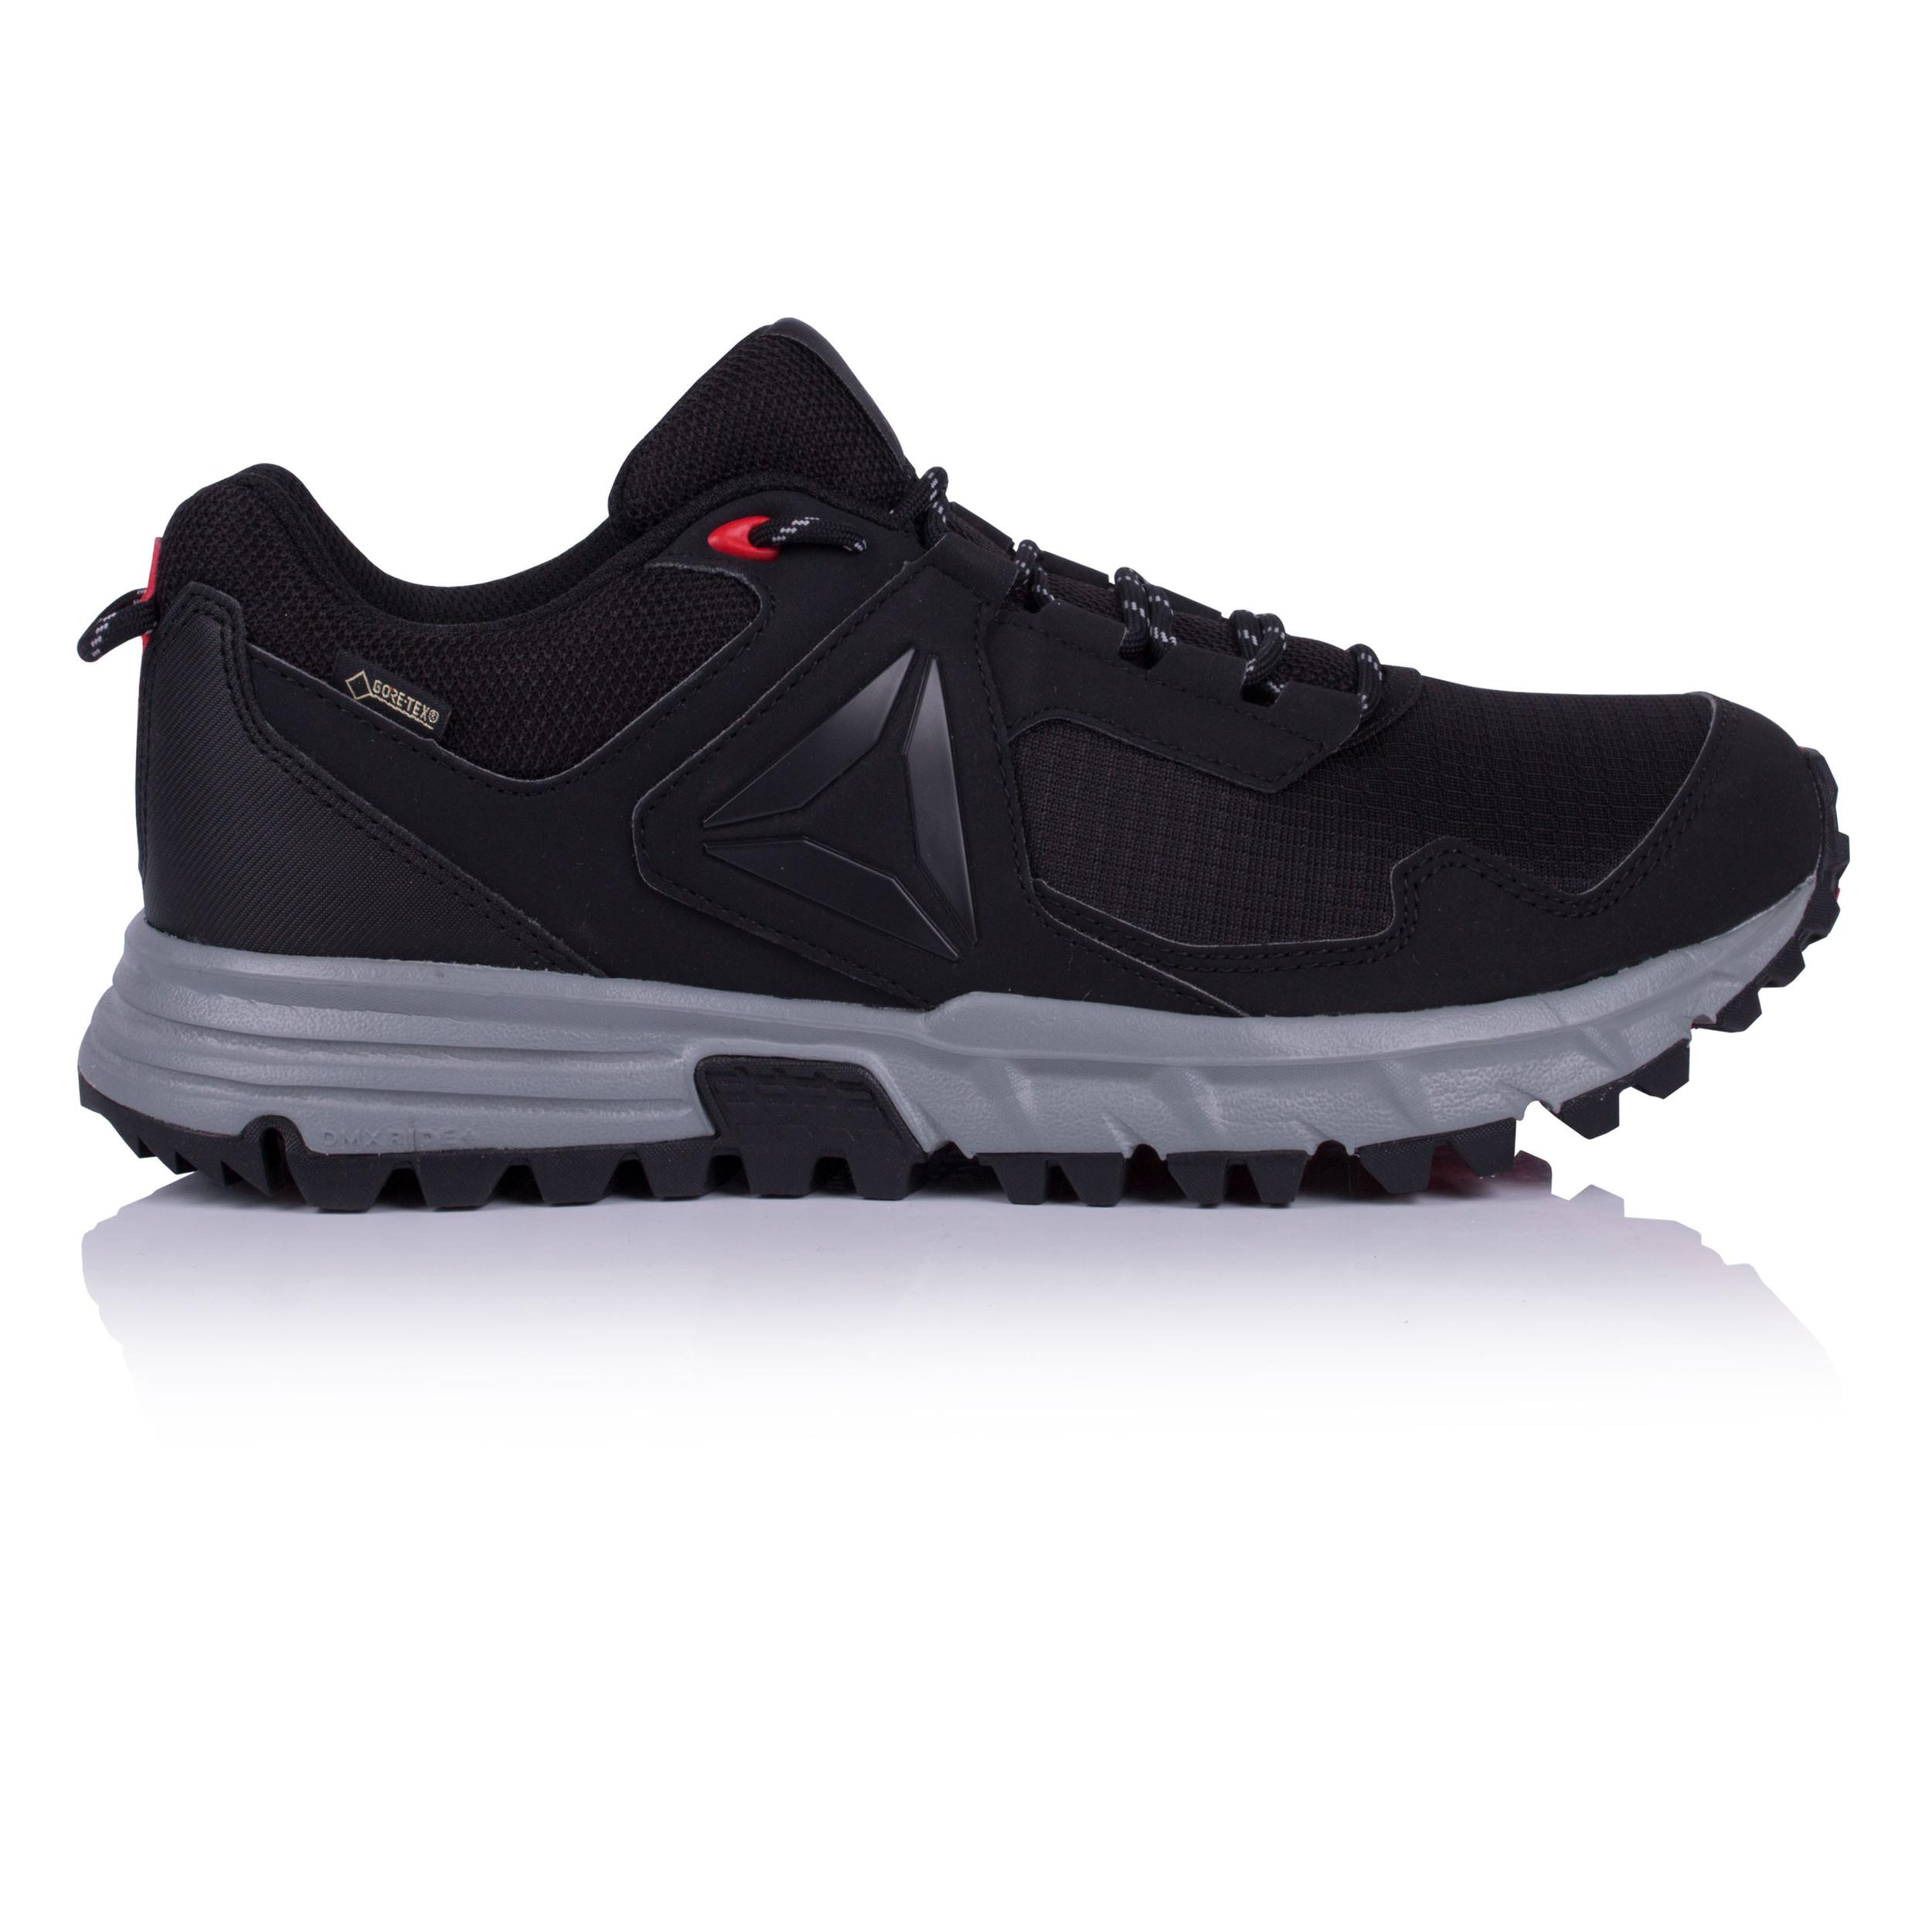 c916870d50fae Details about Reebok Mens Sawcut 5.0 GORE-TEX Walking Shoe Black Sports  Outdoors Trainers